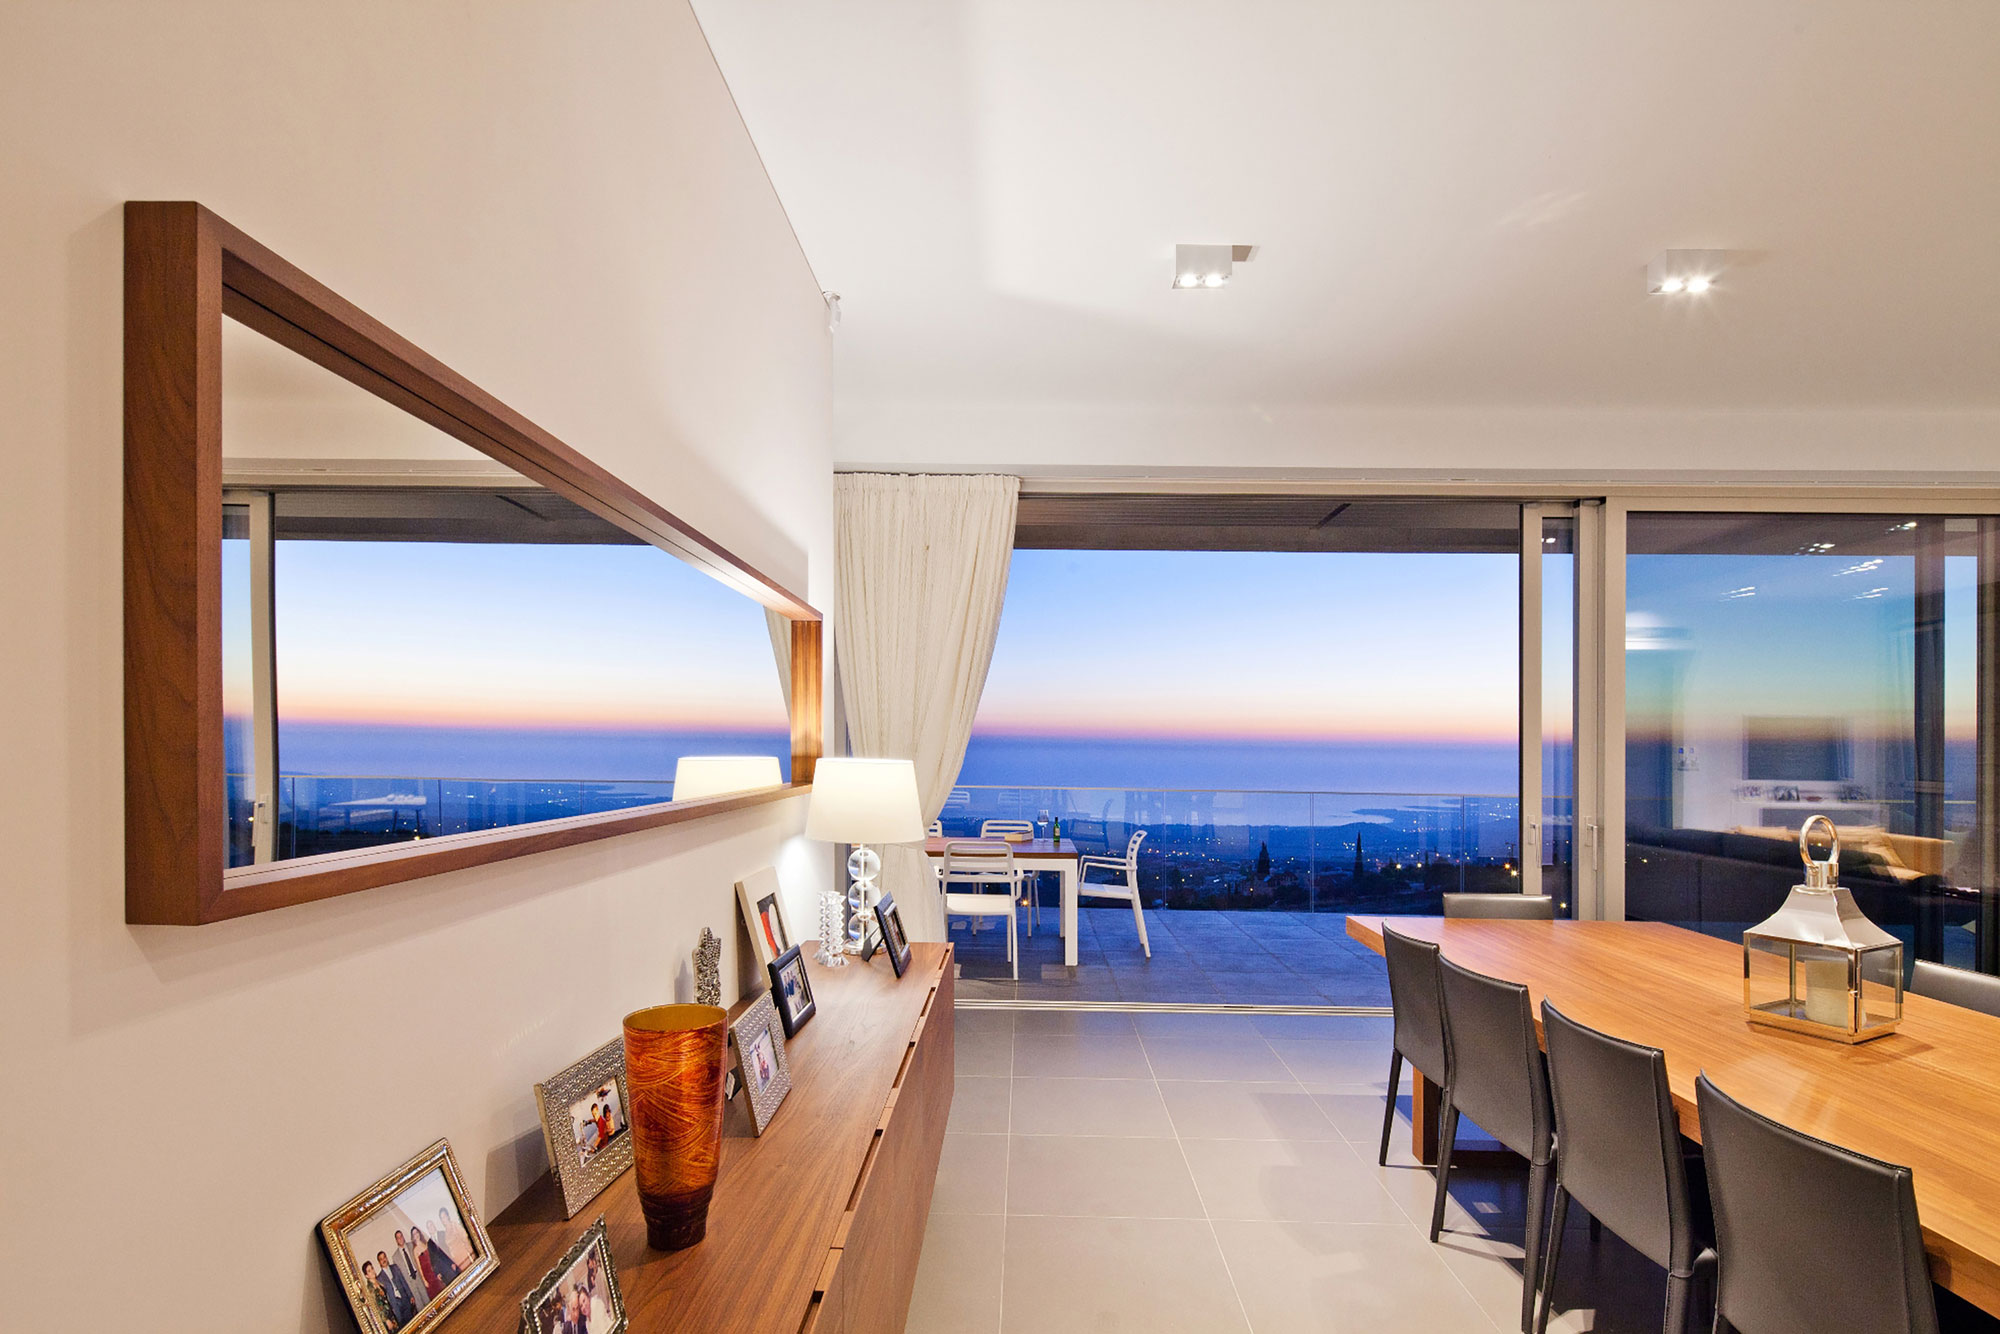 Modern Prodromos and Desi Residence in Paphos by Vardastudio Architects & Designers-11